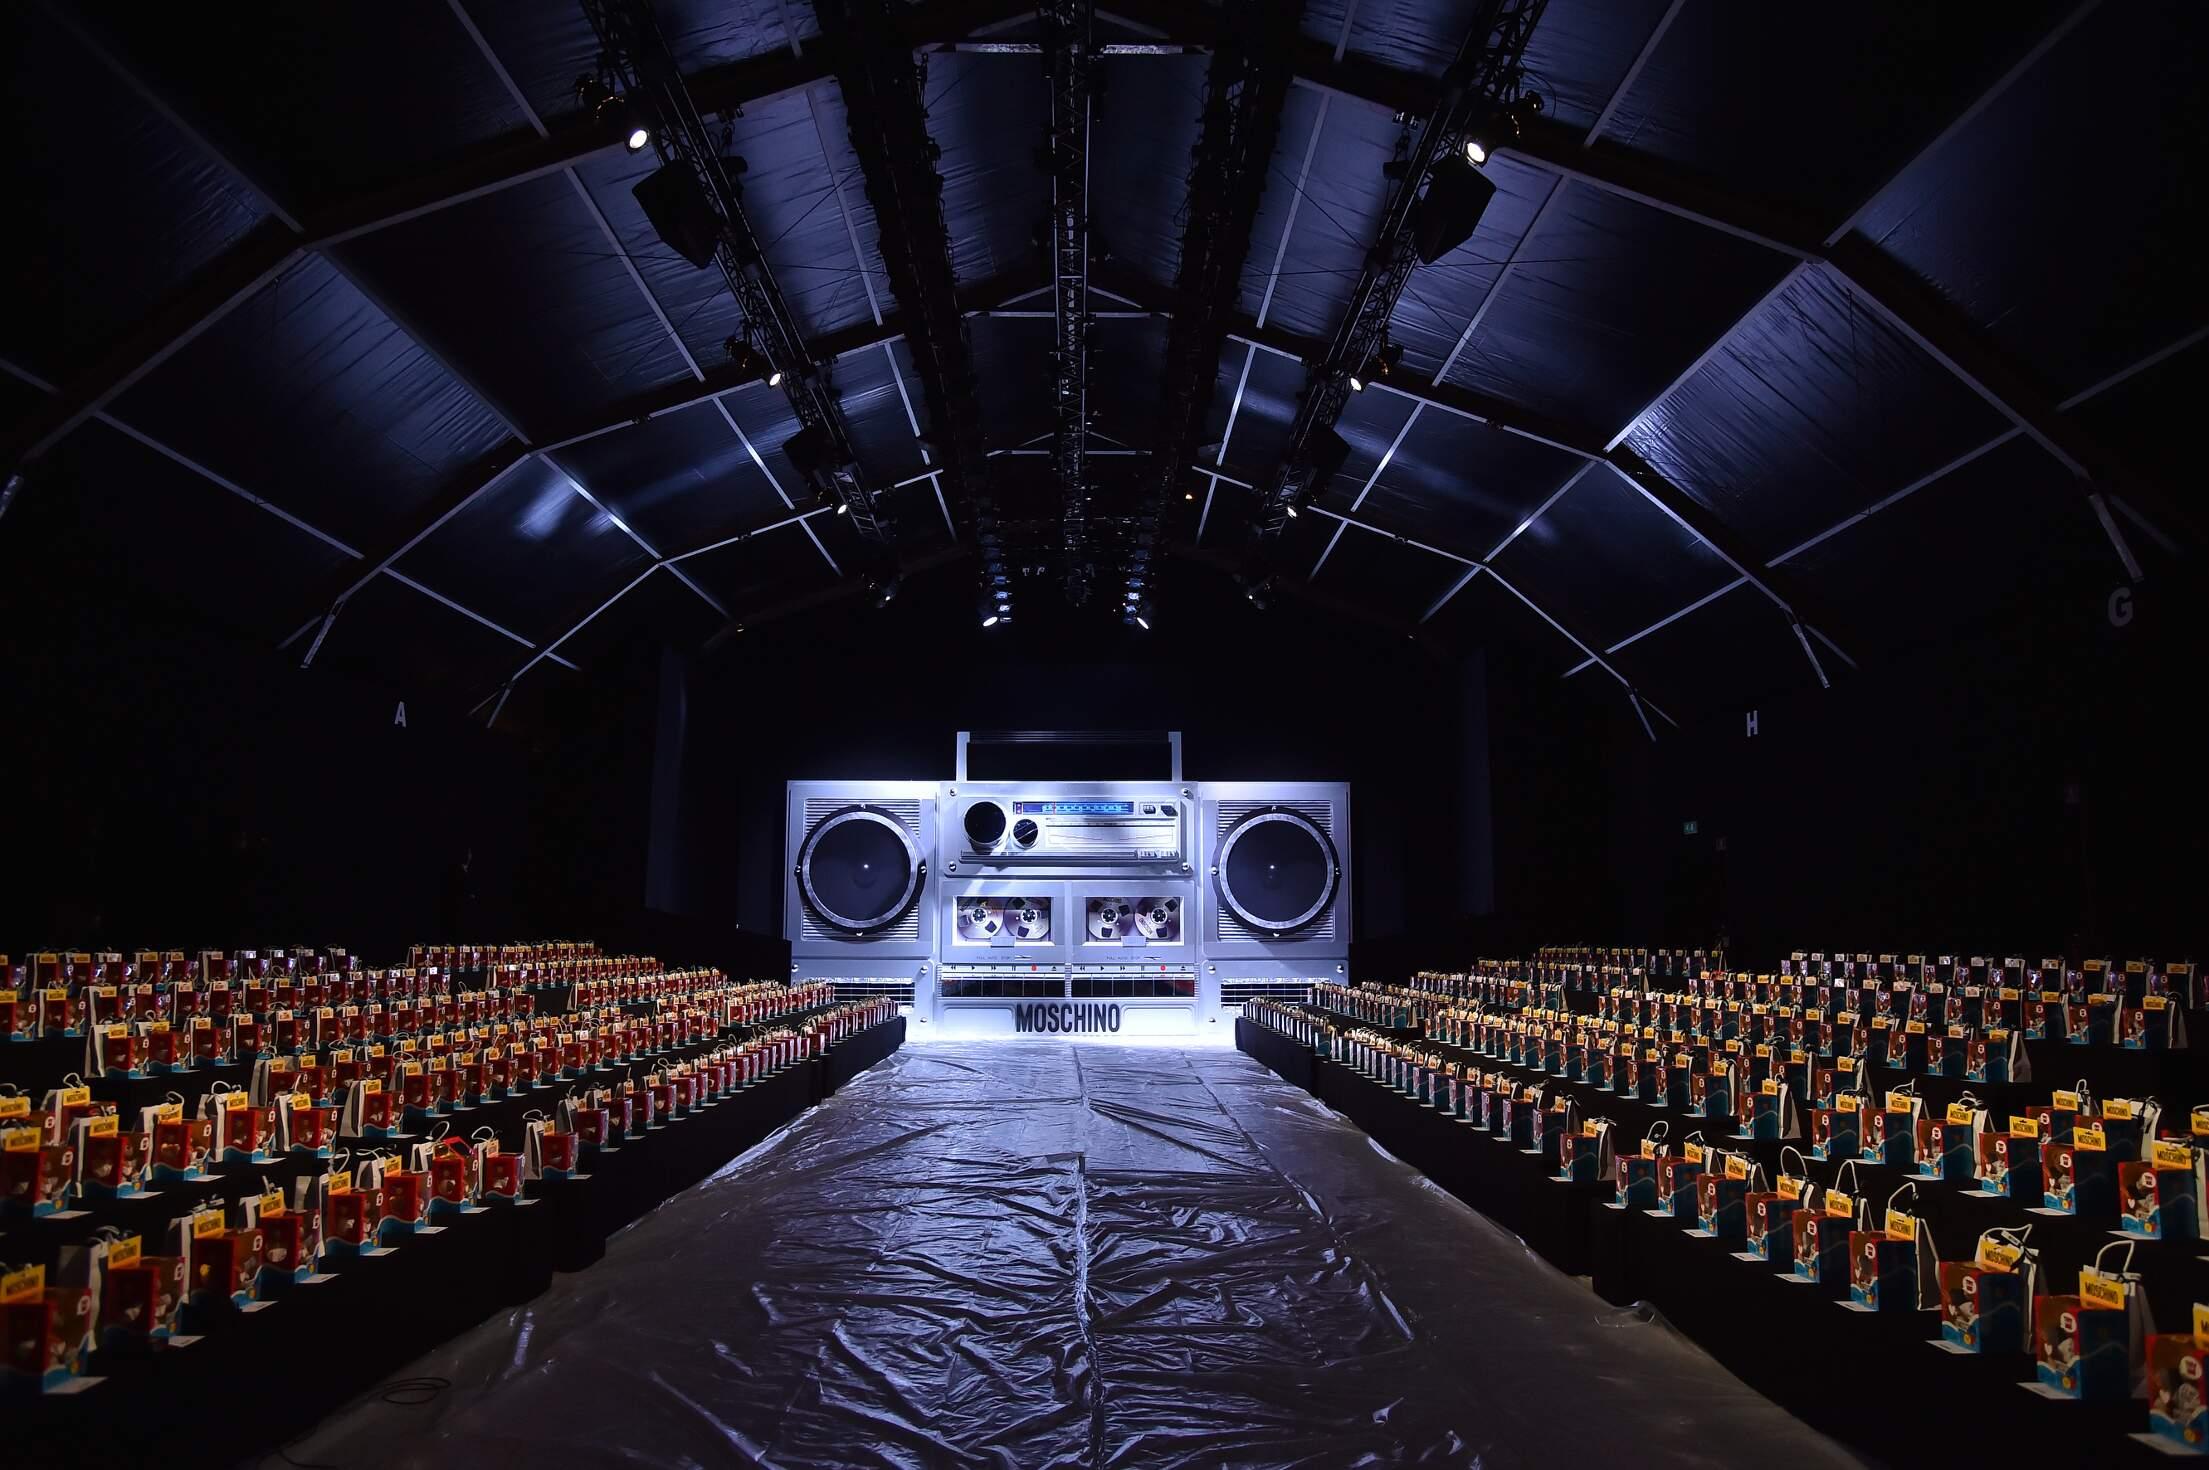 2015 Backstage Fashion Show